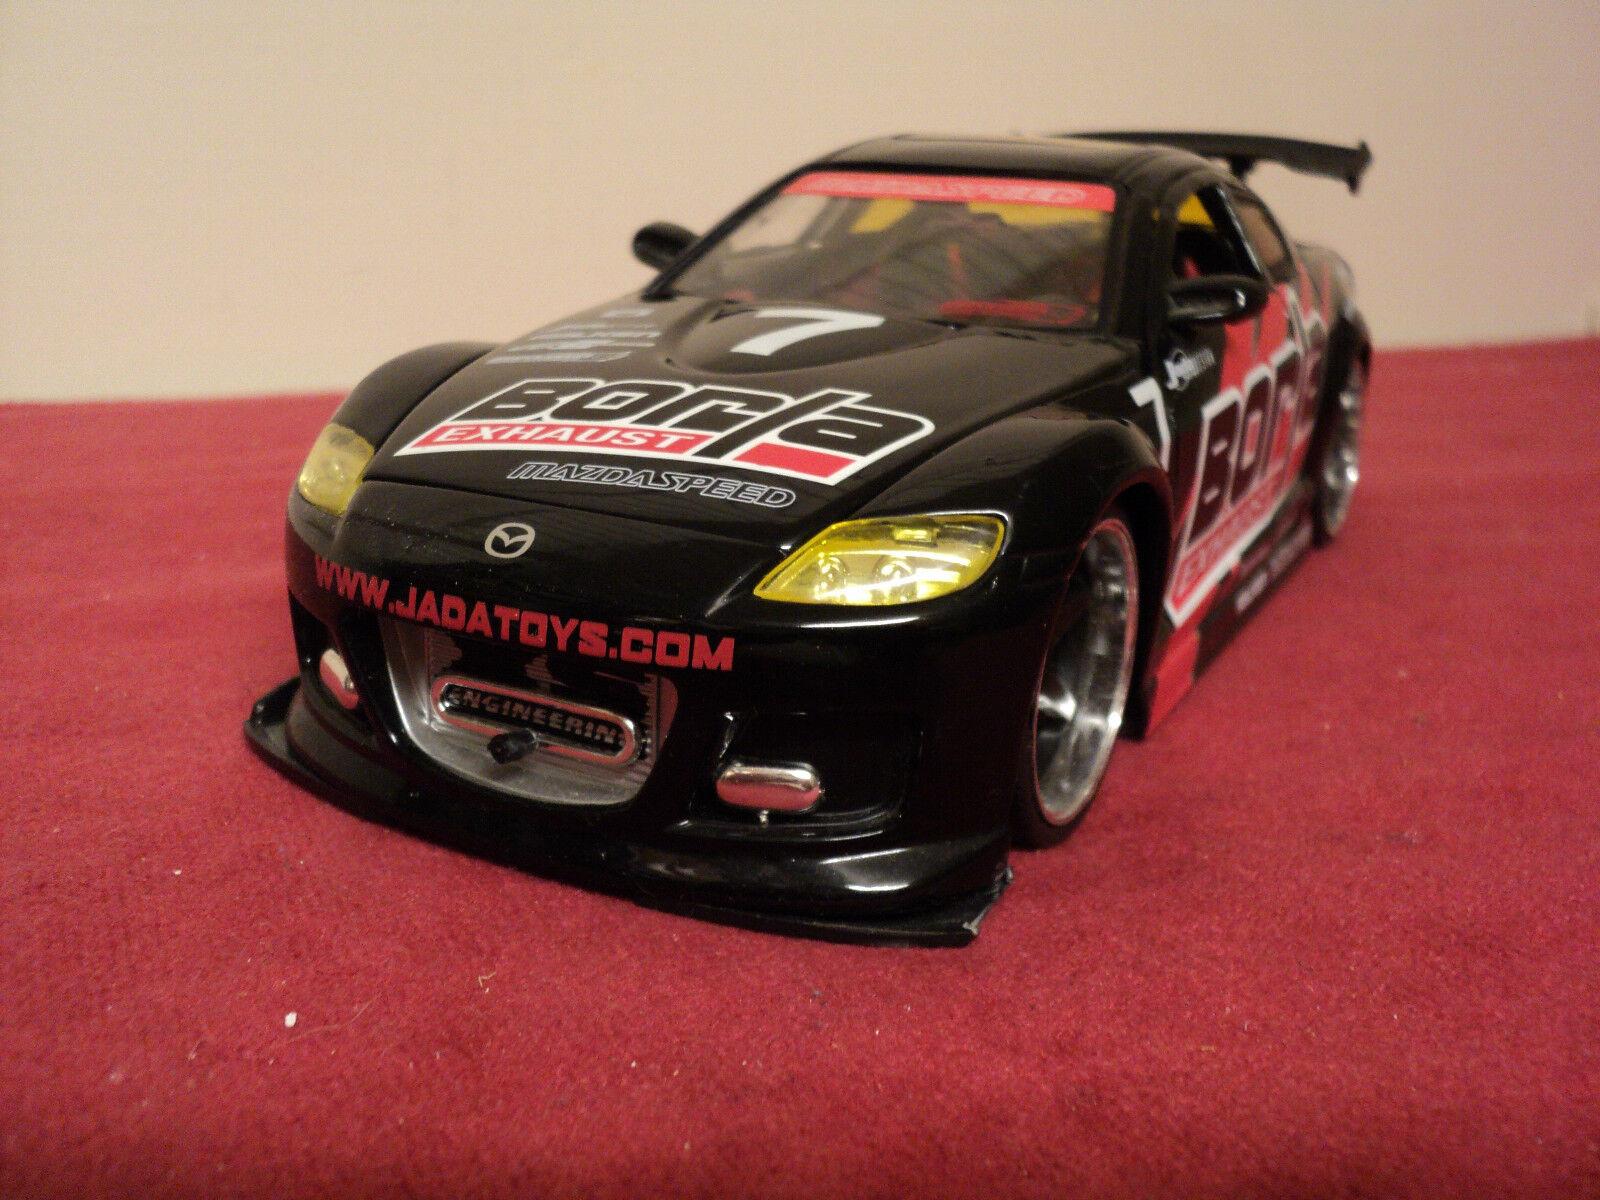 Jada    Mazda RX8  1 24 scale  Import Racer NO LONGER MADE   Rare BORLA GRAPHICS